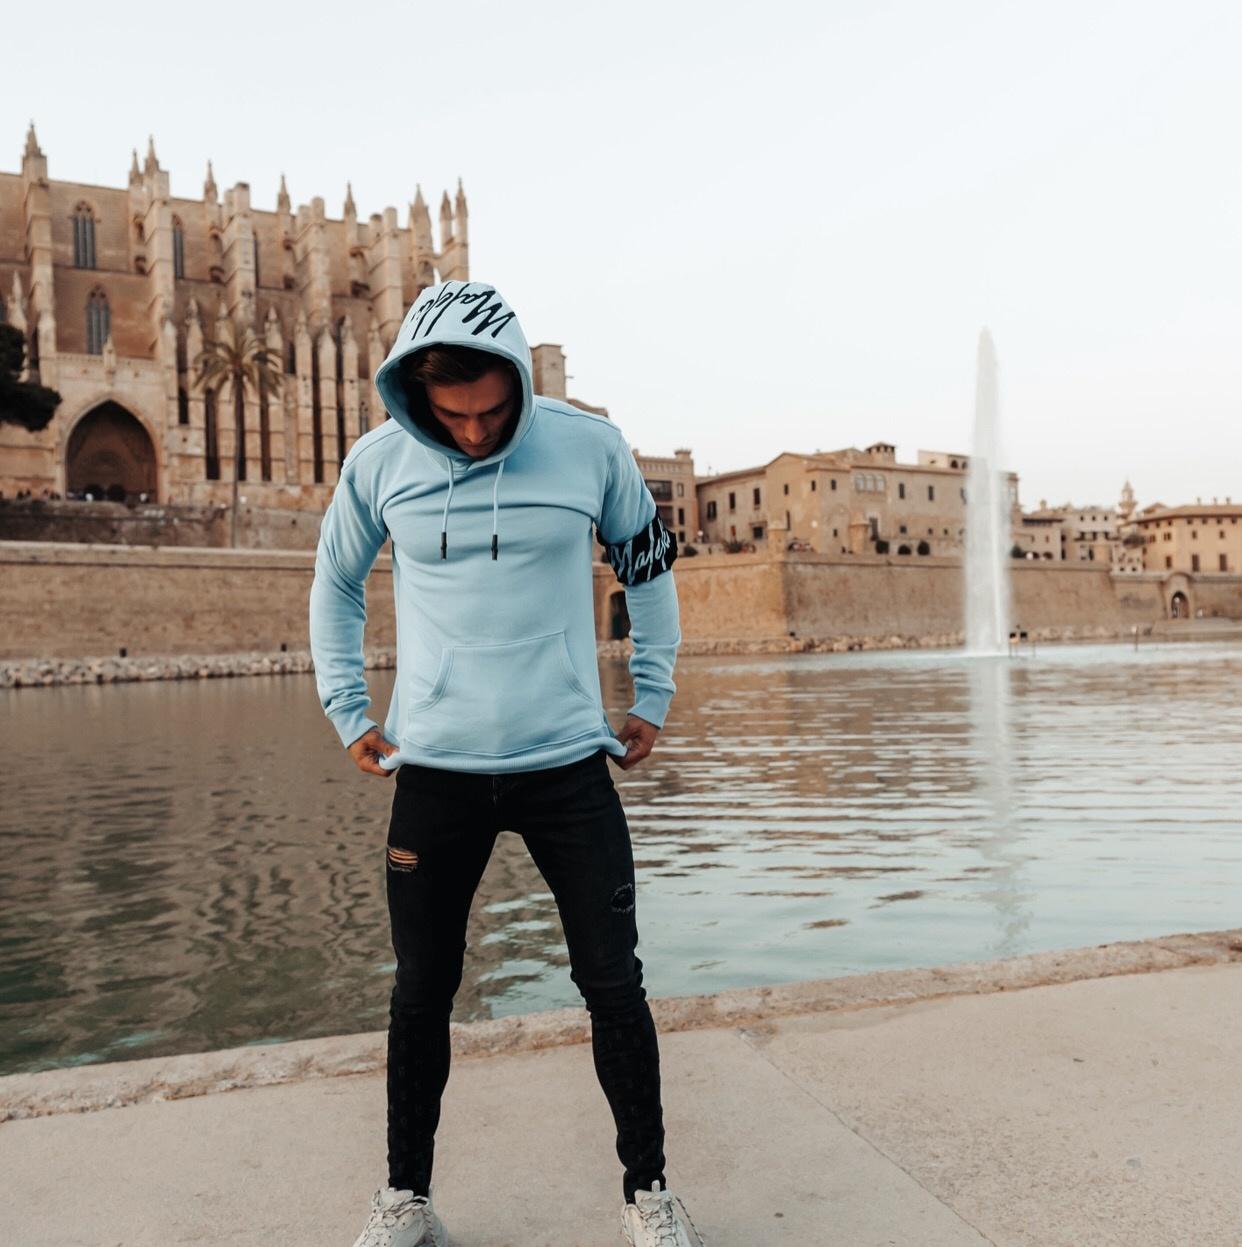 captain hoodie malelions